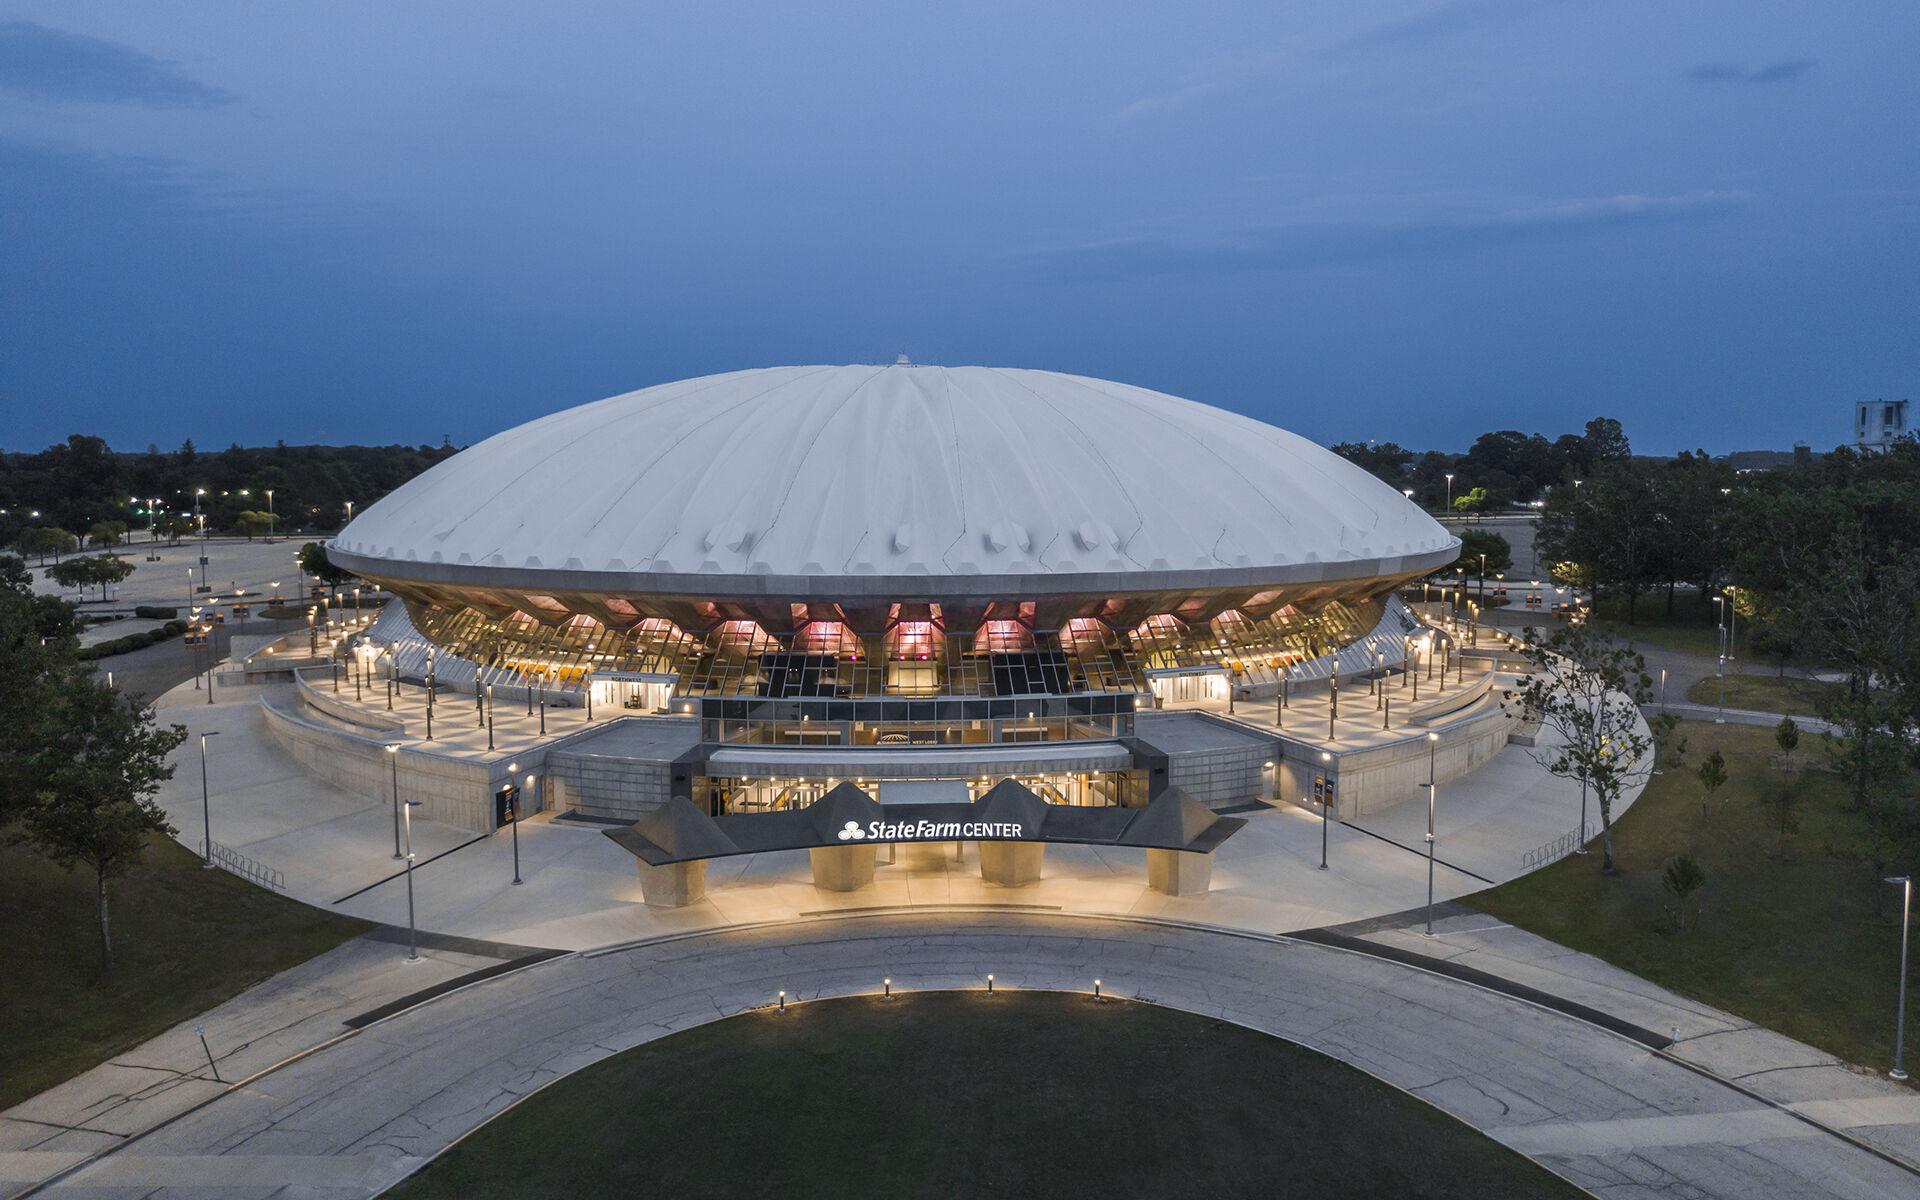 State Farm Center - University of Illinois